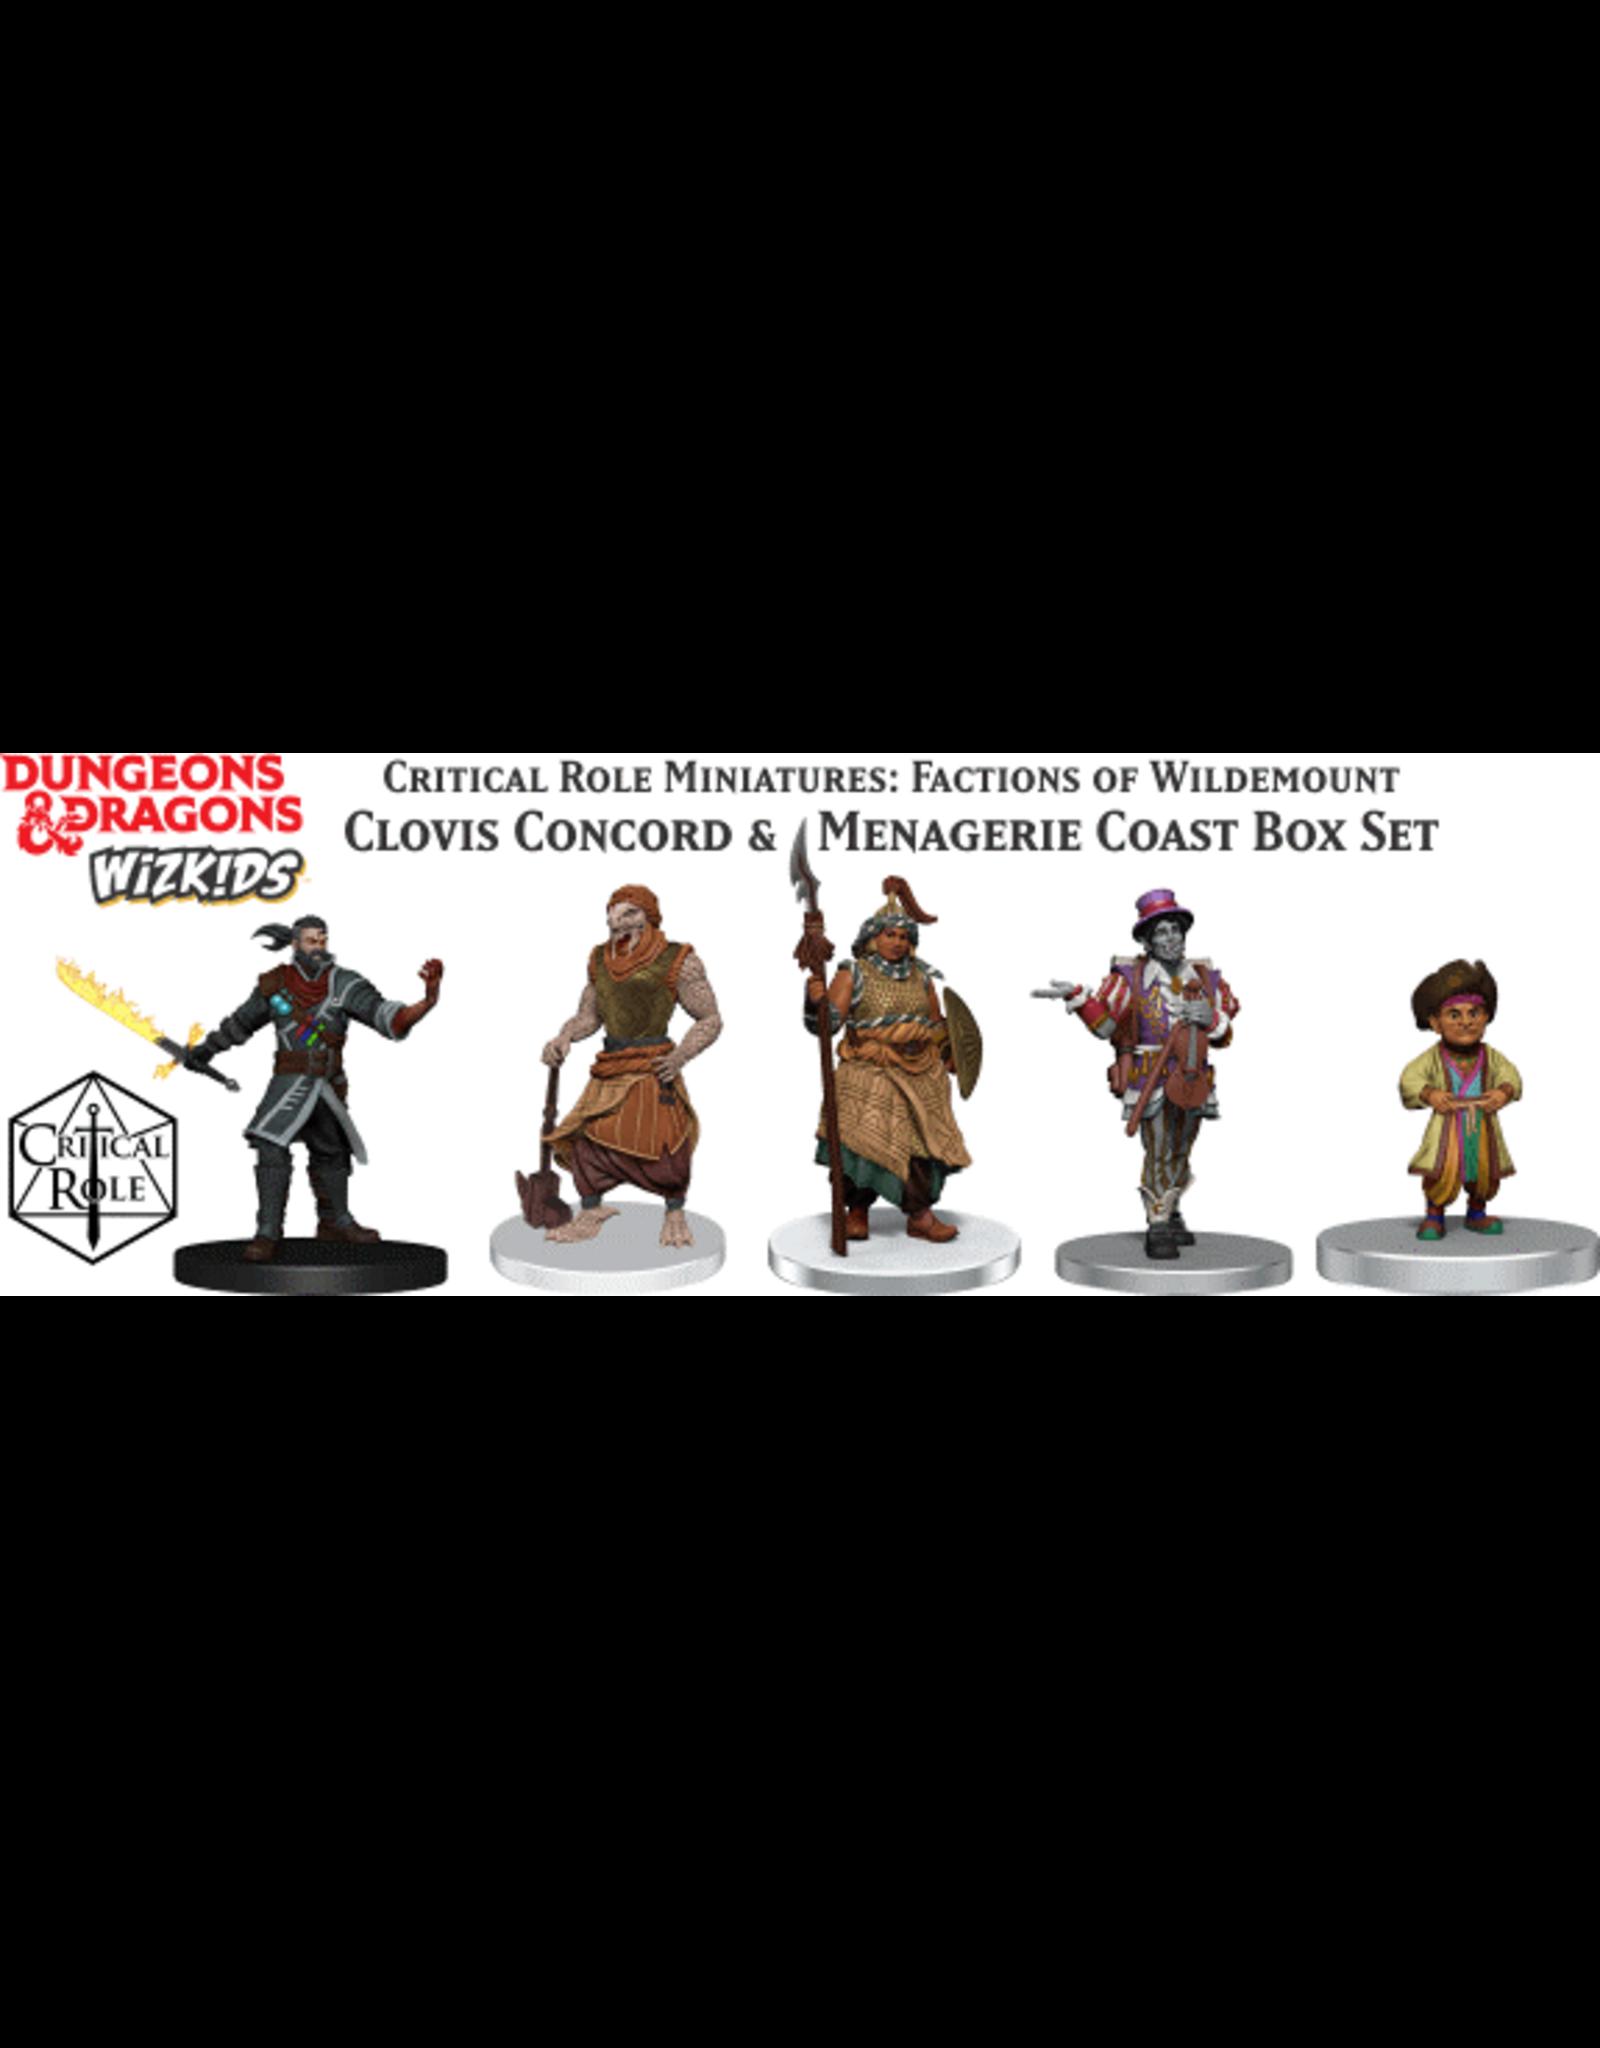 WizKids Dungeons & Dragons Critical Role Miniatures Factions of Wildemount Clovis